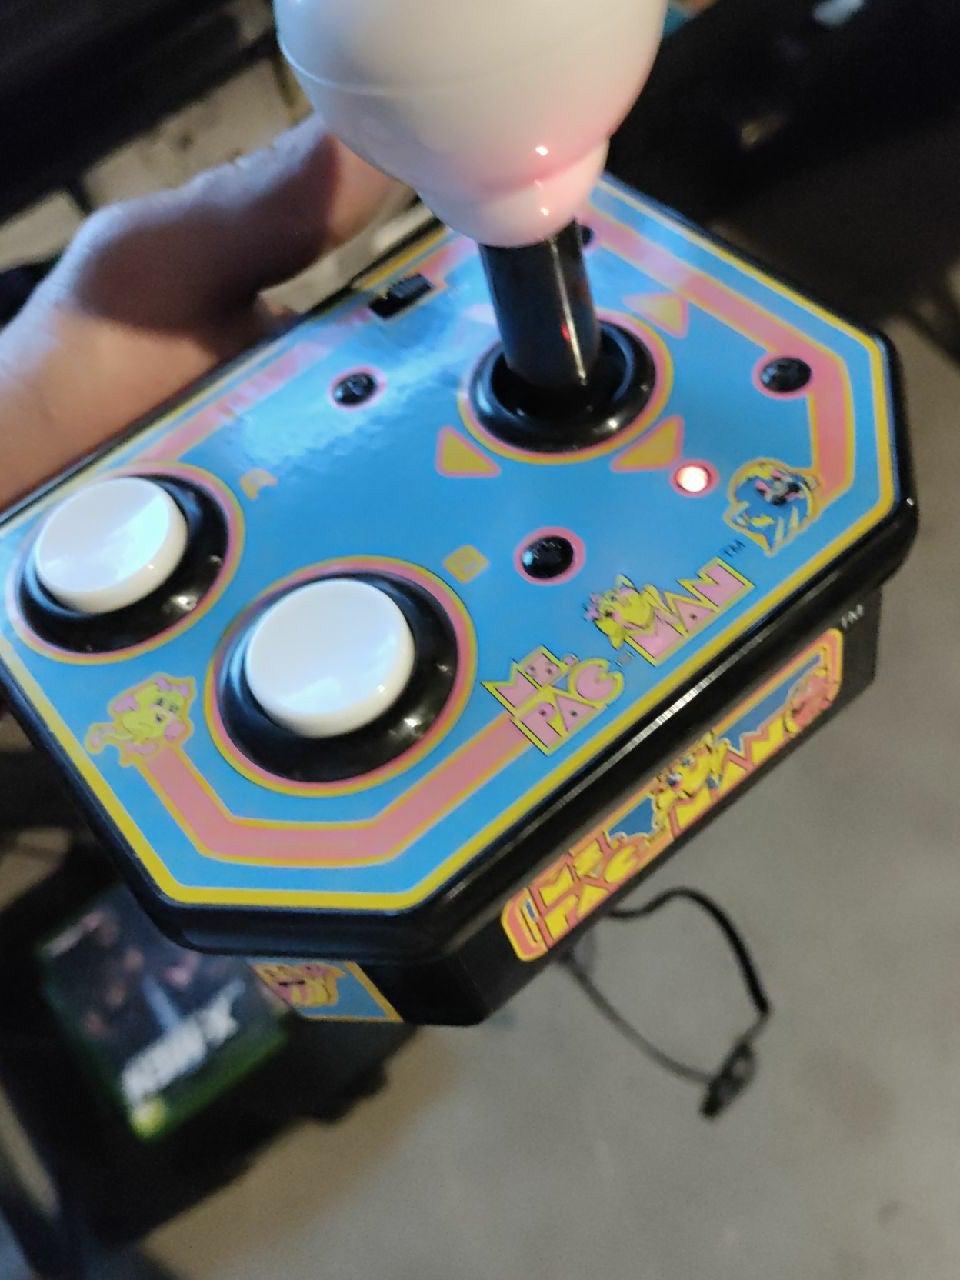 Ms Pac-Man plug and Play